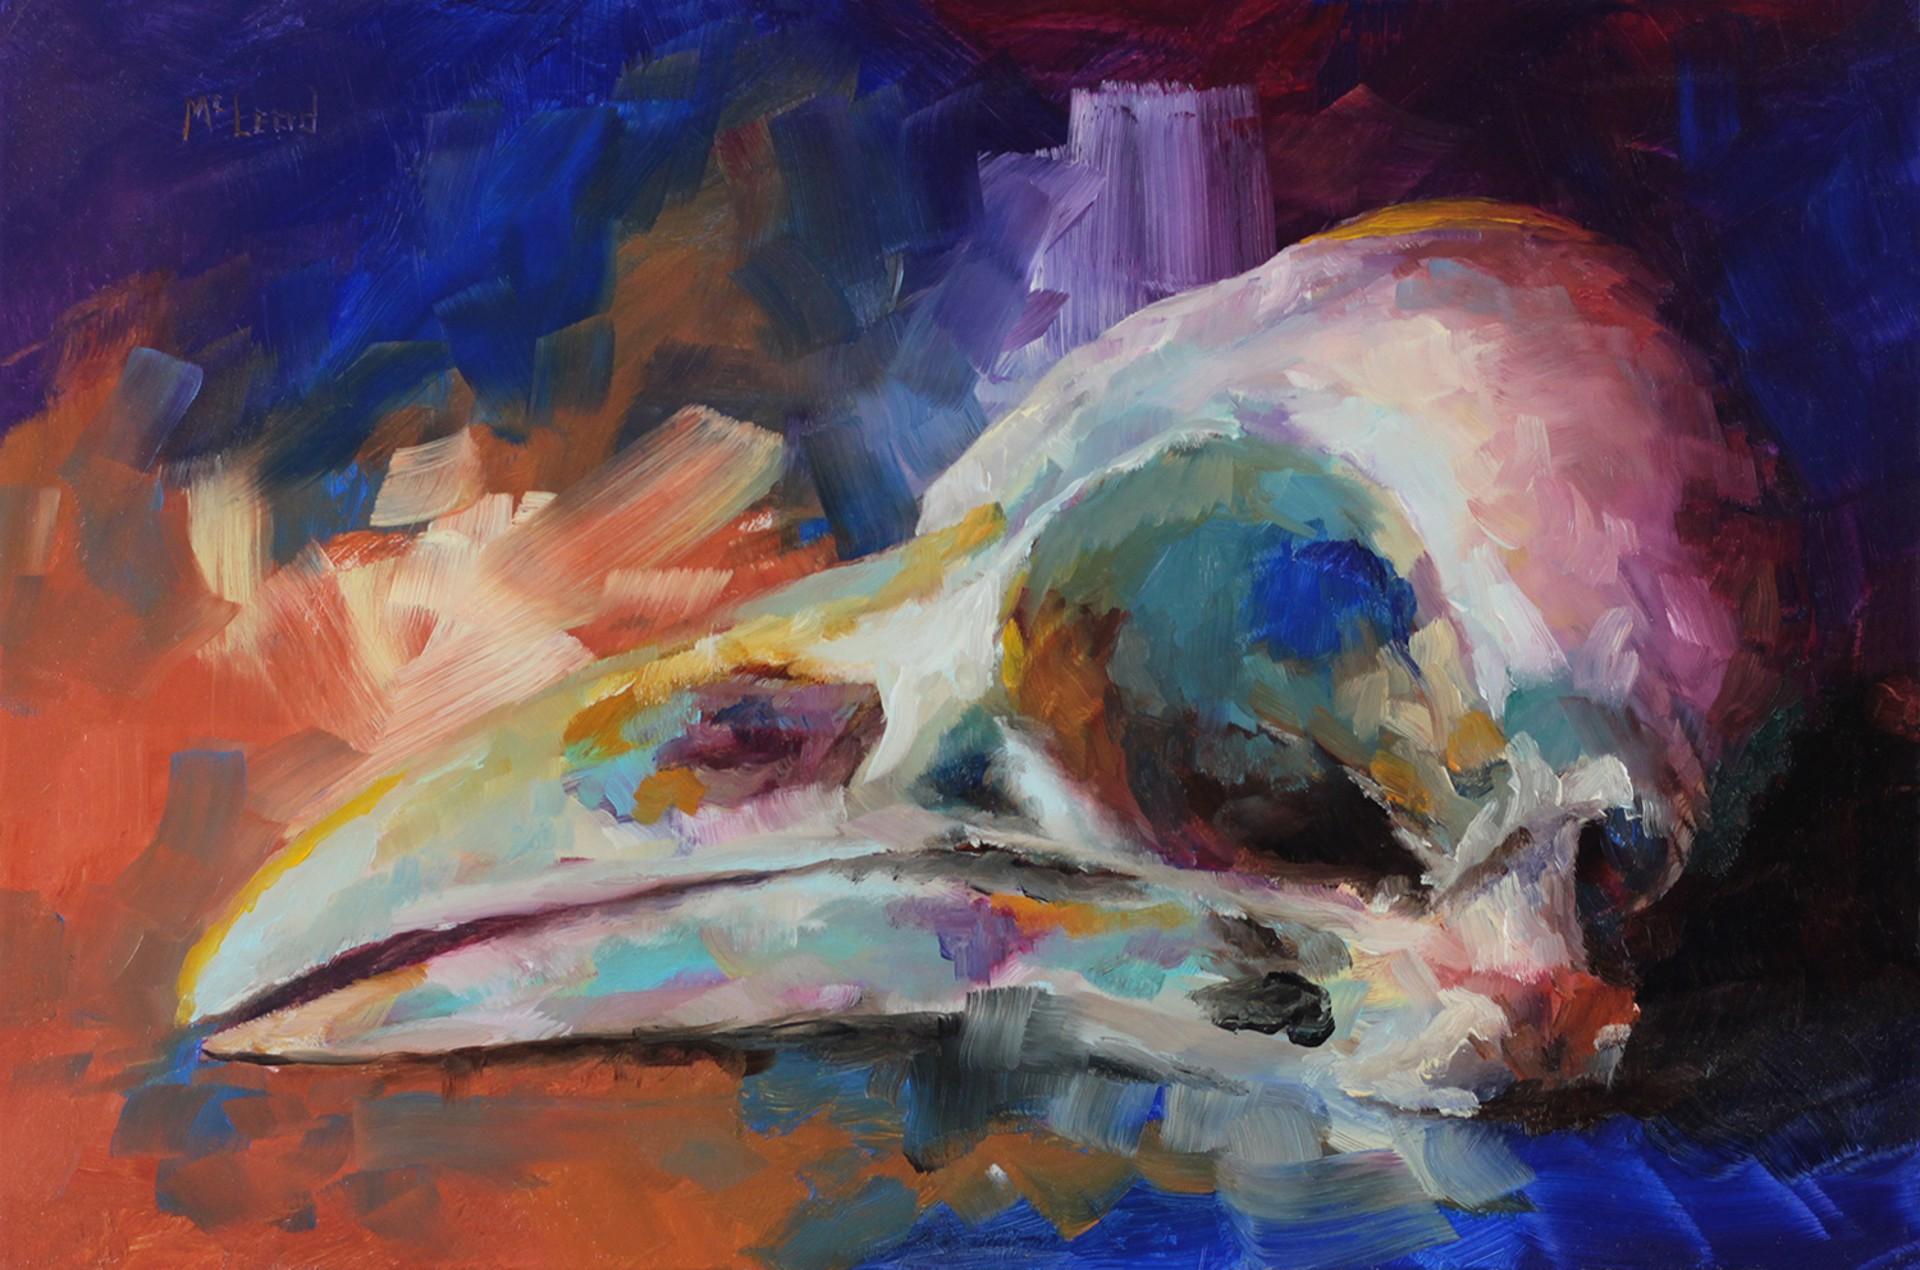 Crow Skull by John McLeod